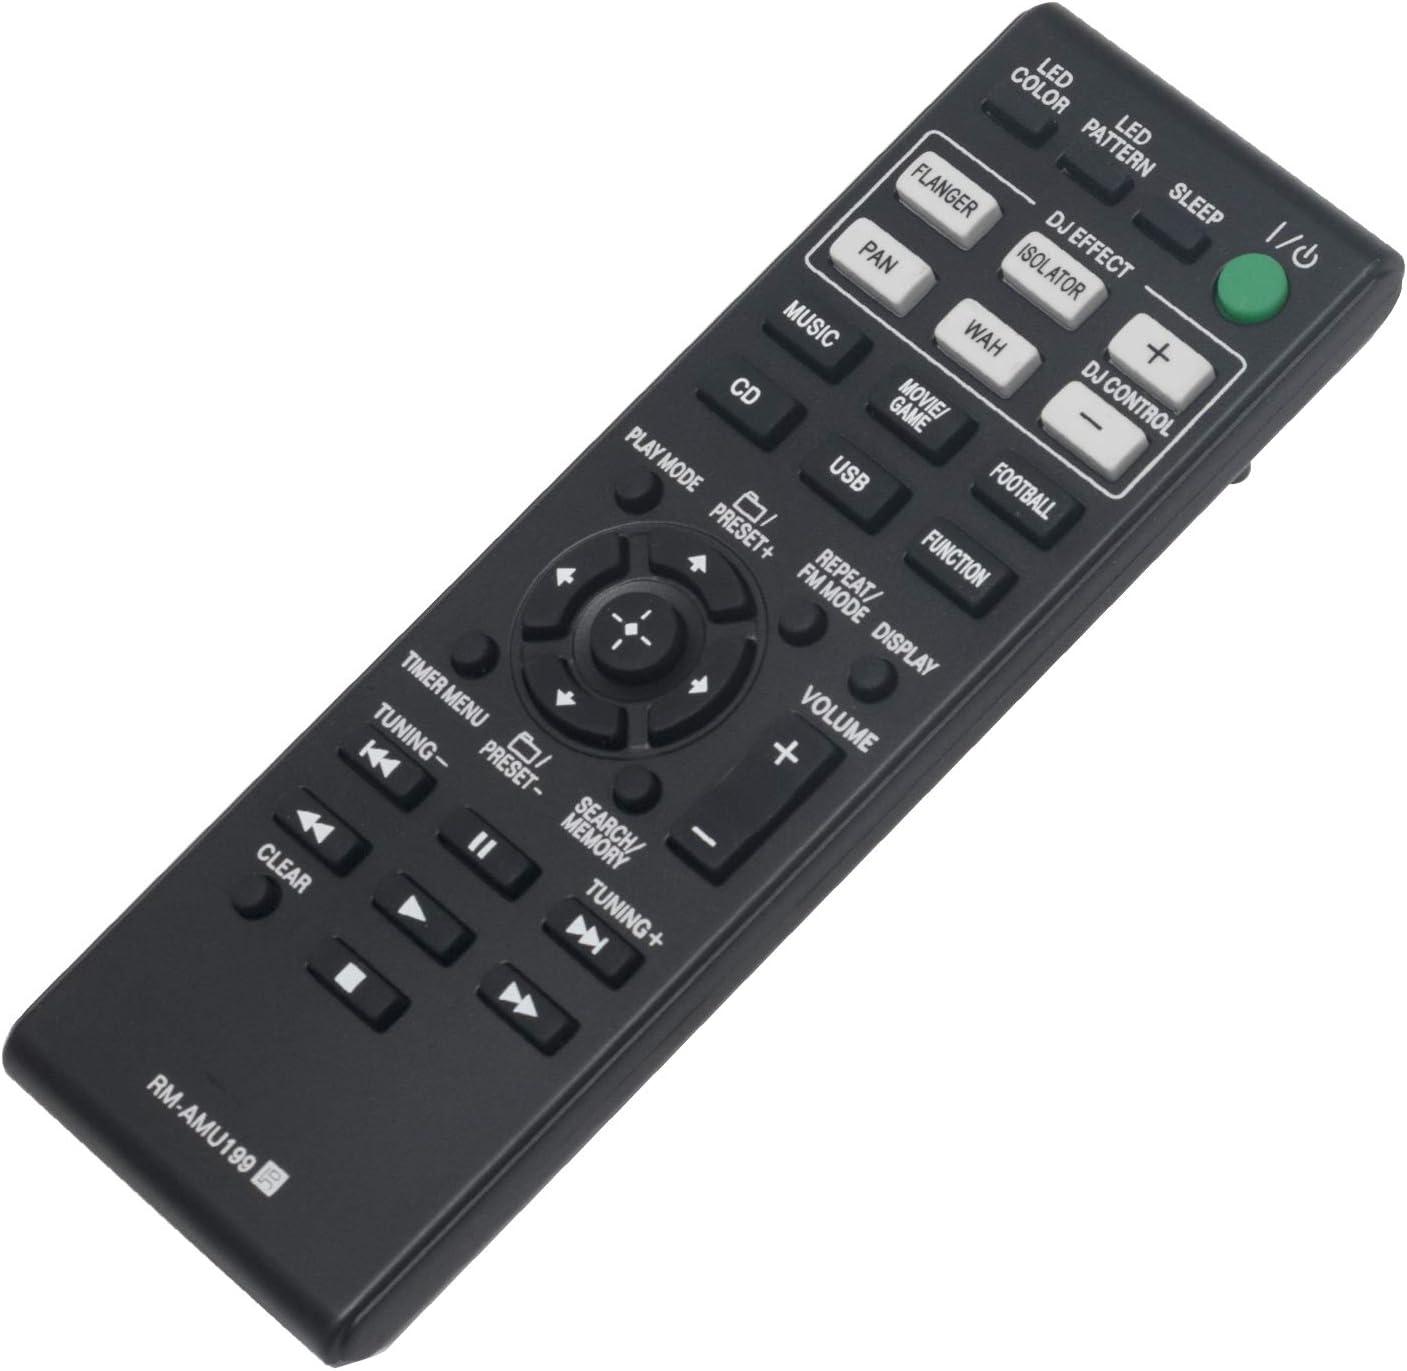 Control remoto para Sony HCD-SHAKE33/55/77